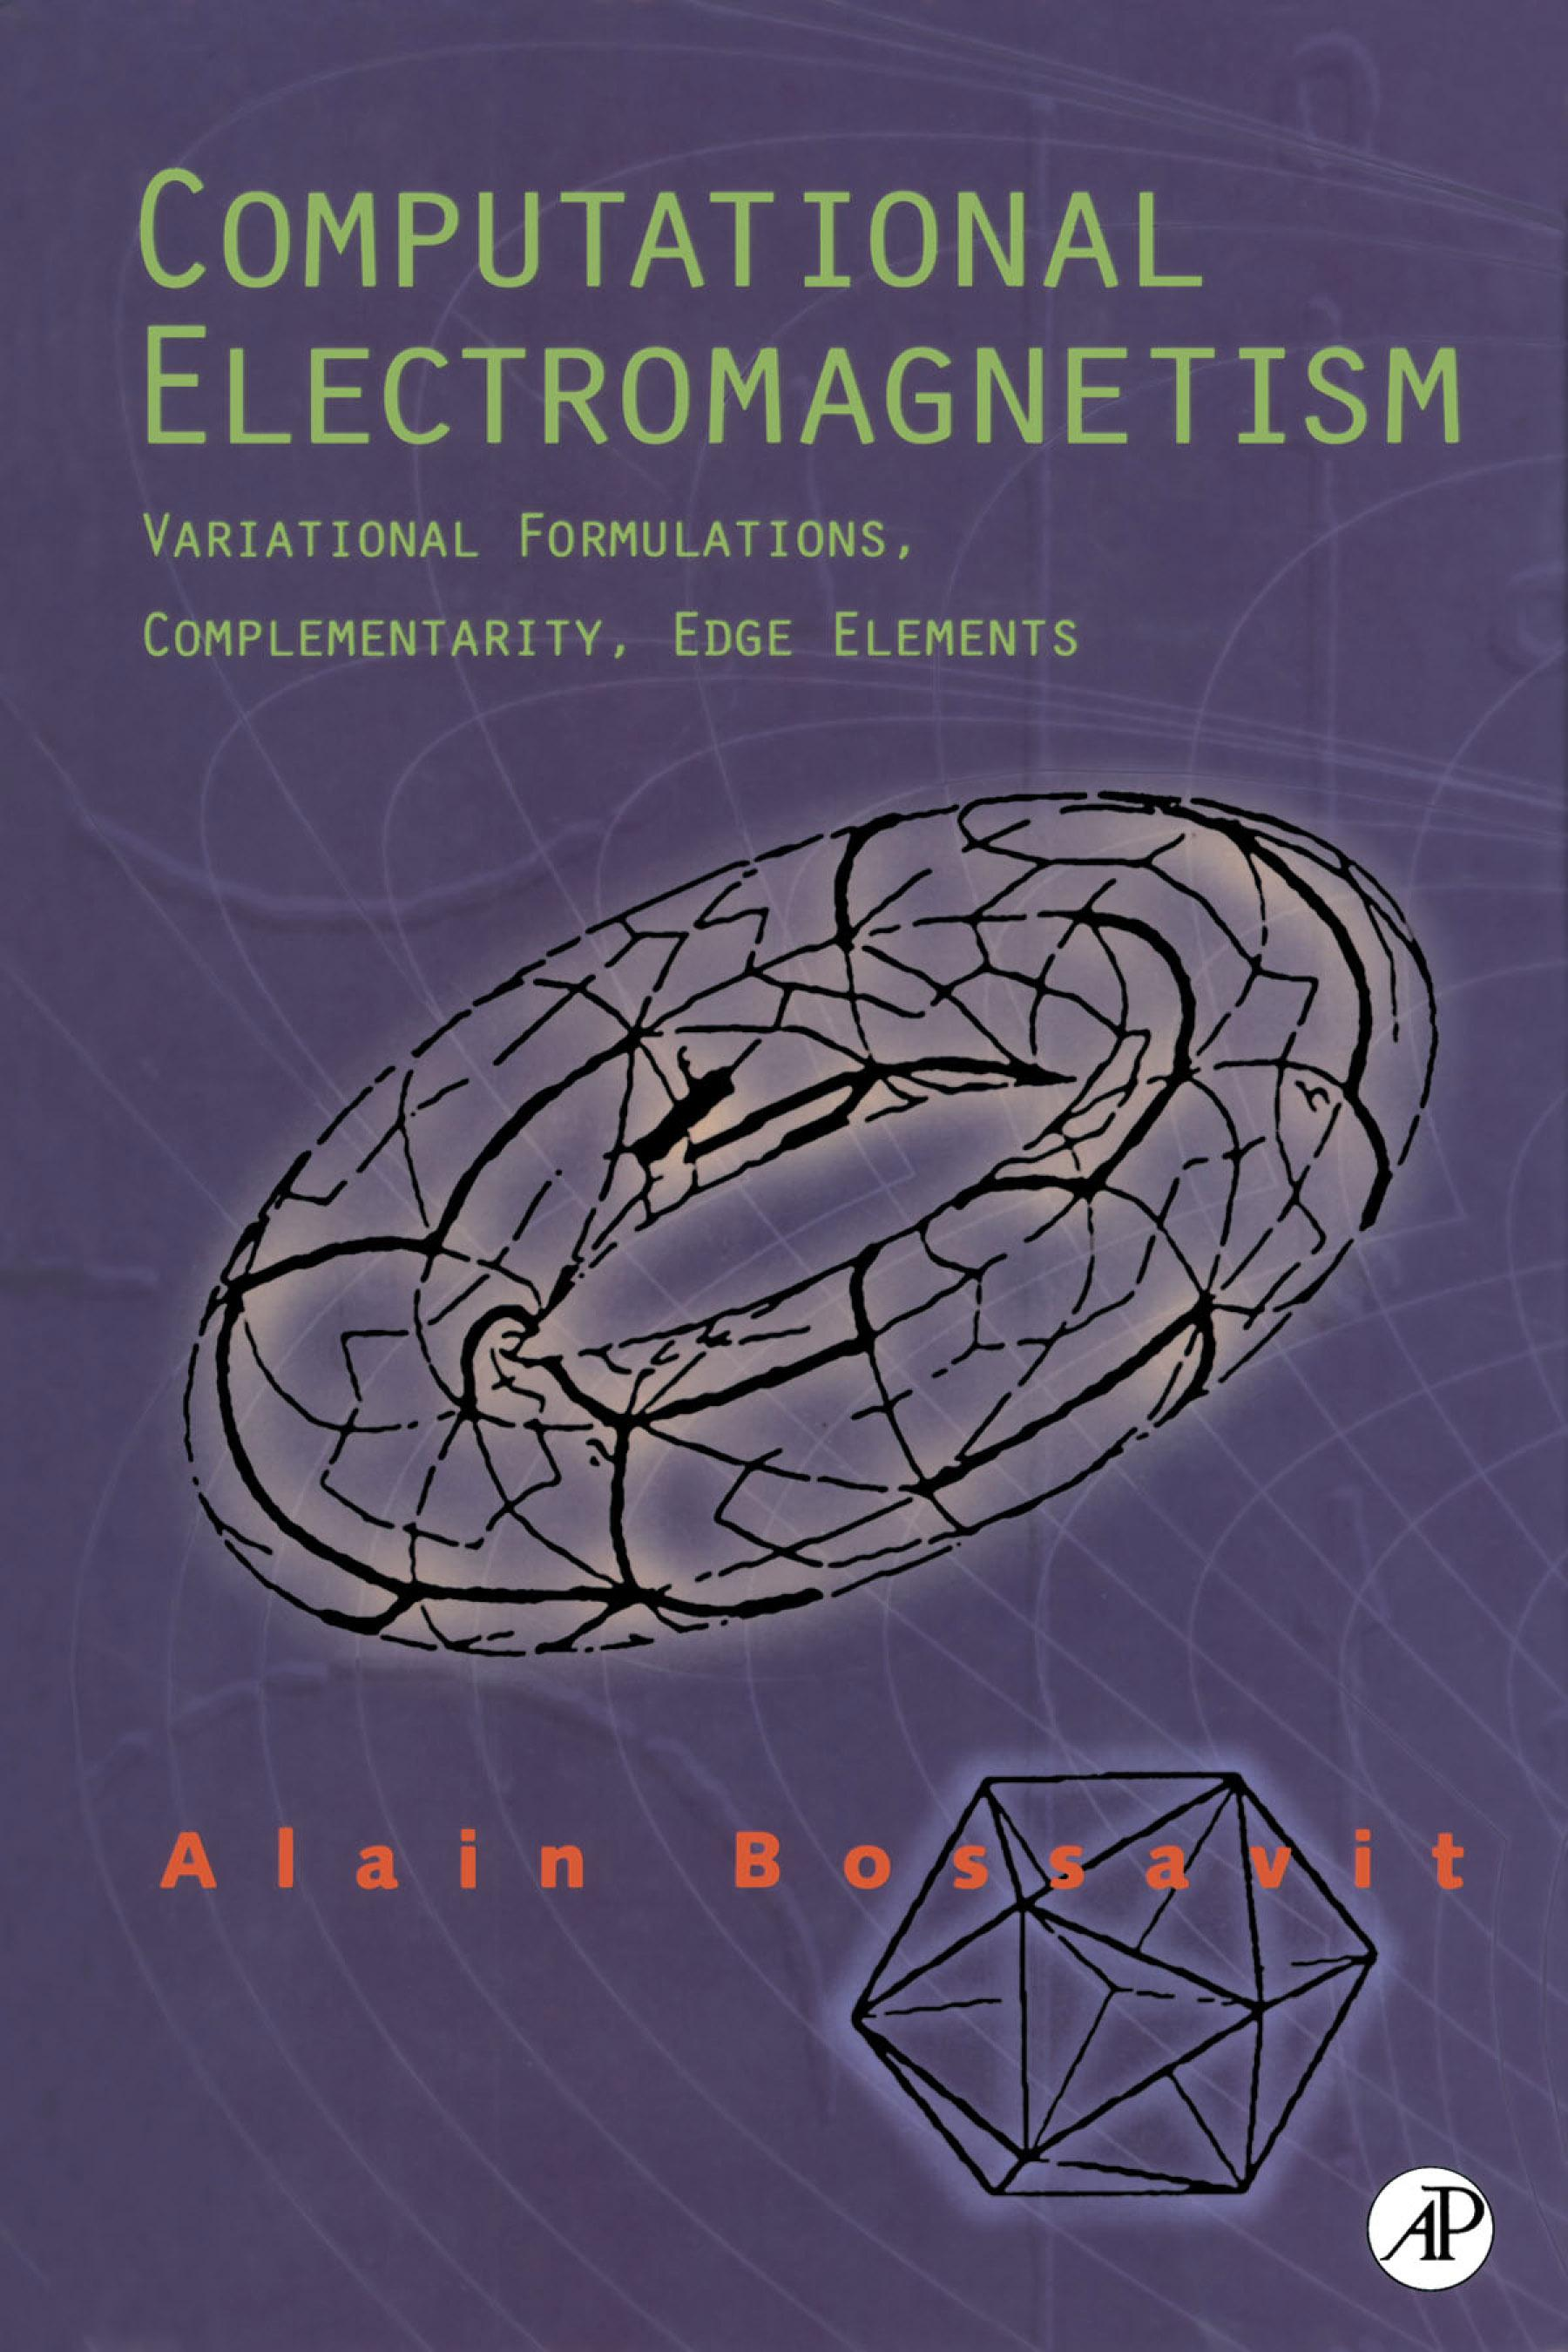 Computational Electromagnetism: Variational Formulations, Complementarity, Edge Elements EB9780080529660